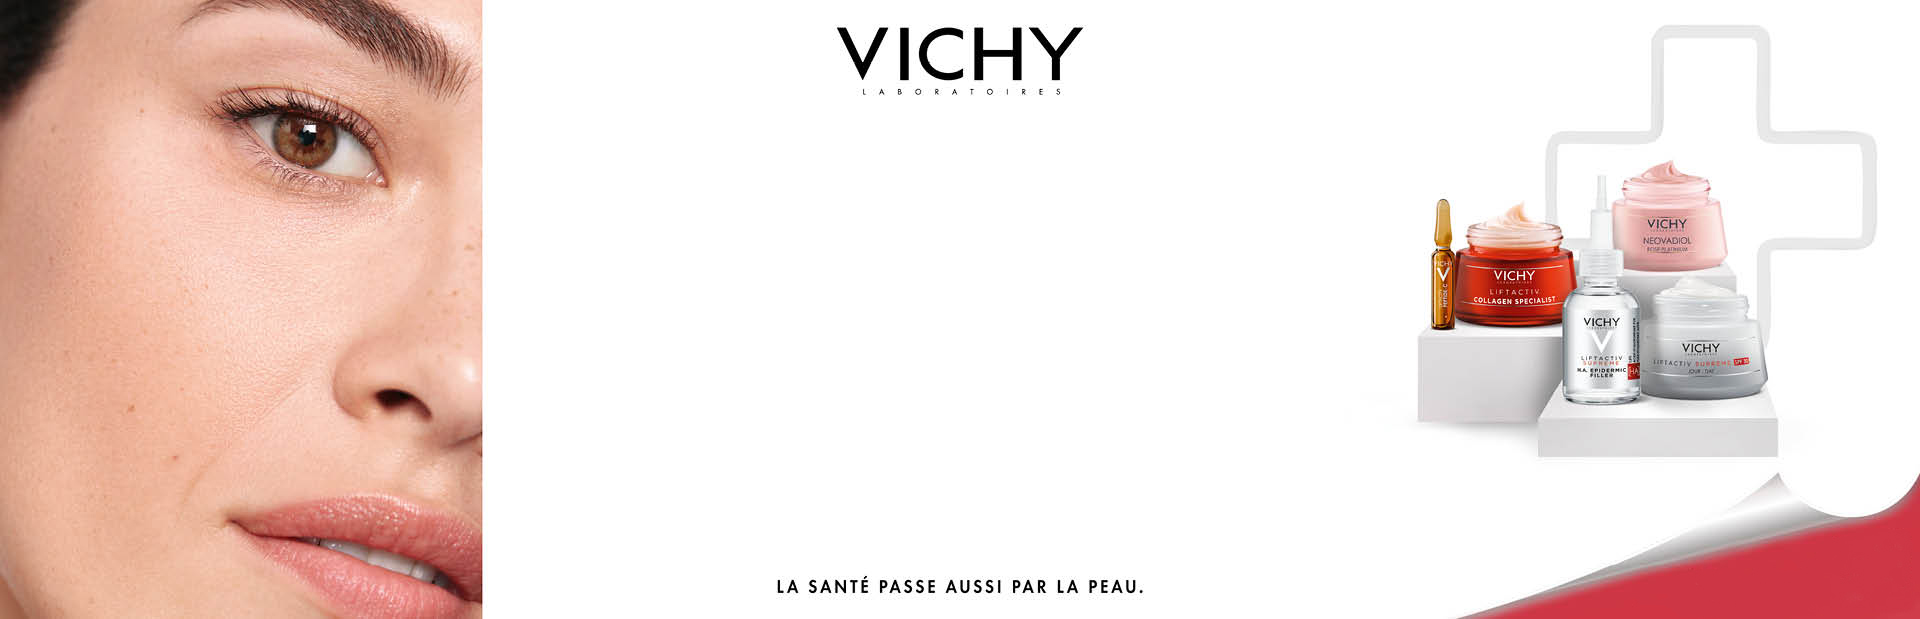 Vichy pas cher